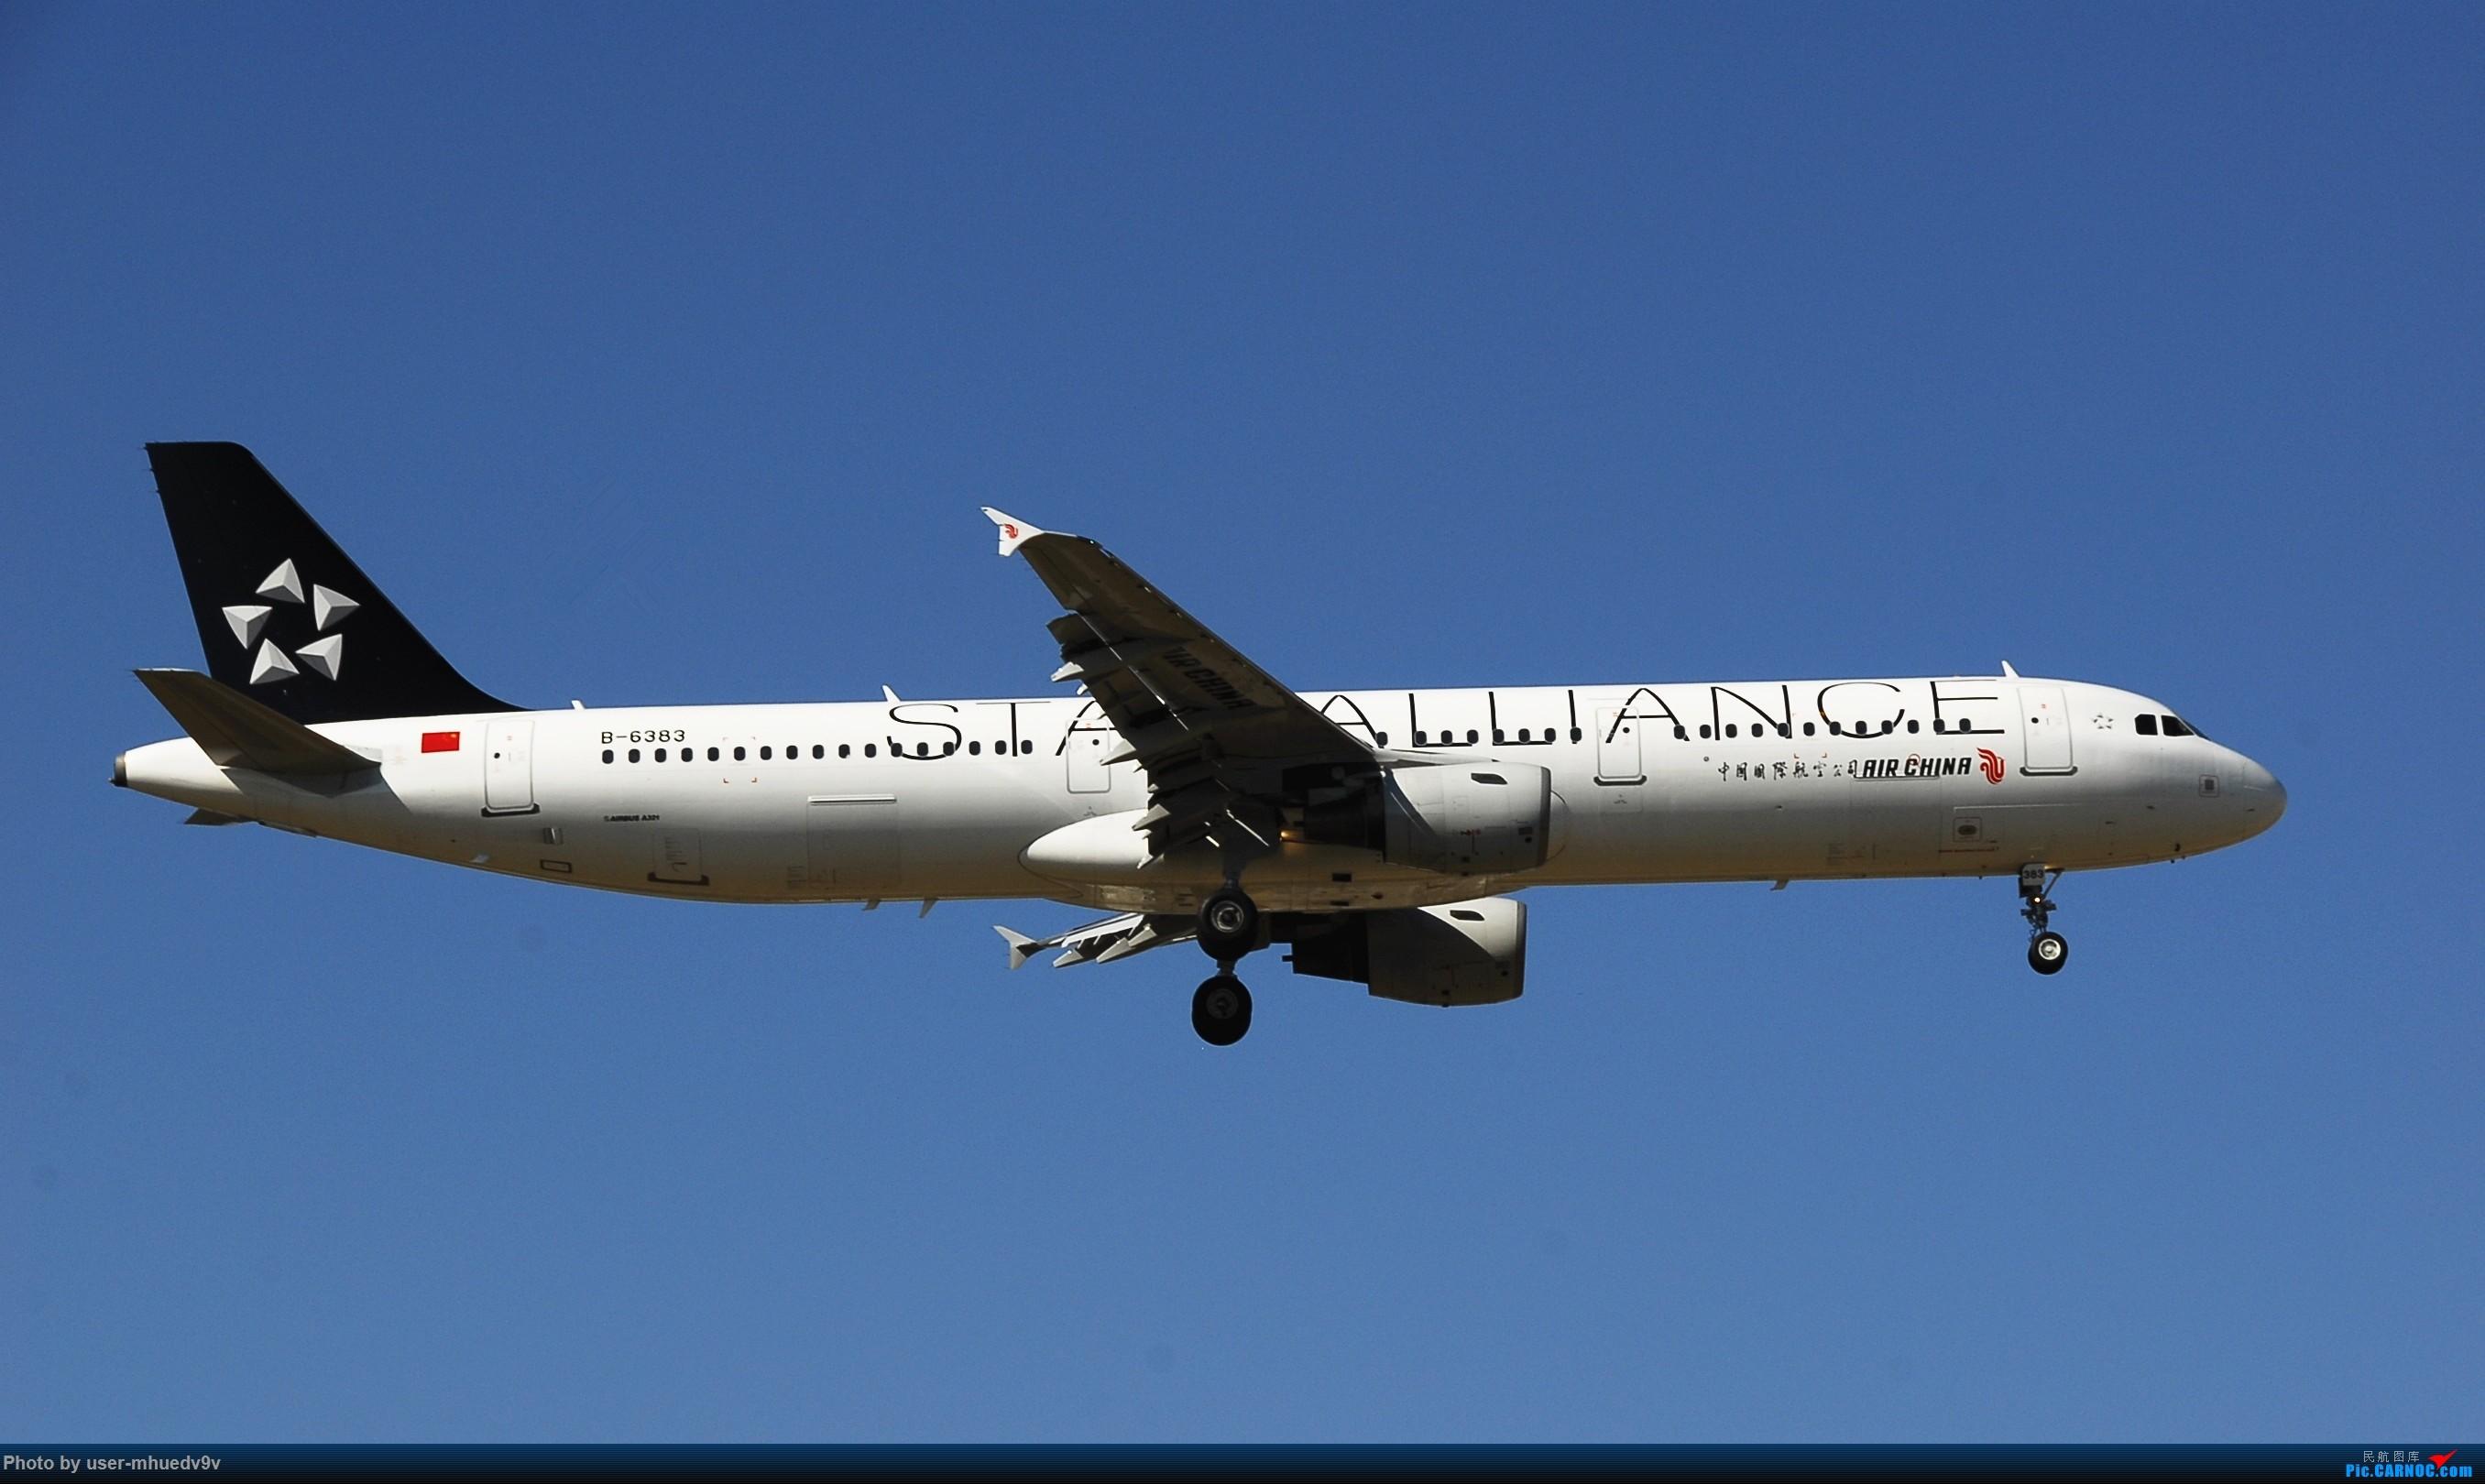 Re:[原创]十一难得北京妖天,萌新ZBAA拍机一组干货,大佬勿喷,马上月考更要放飞自我。。。 AIRBUS A321-200 B-6383 中国北京首都国际机场